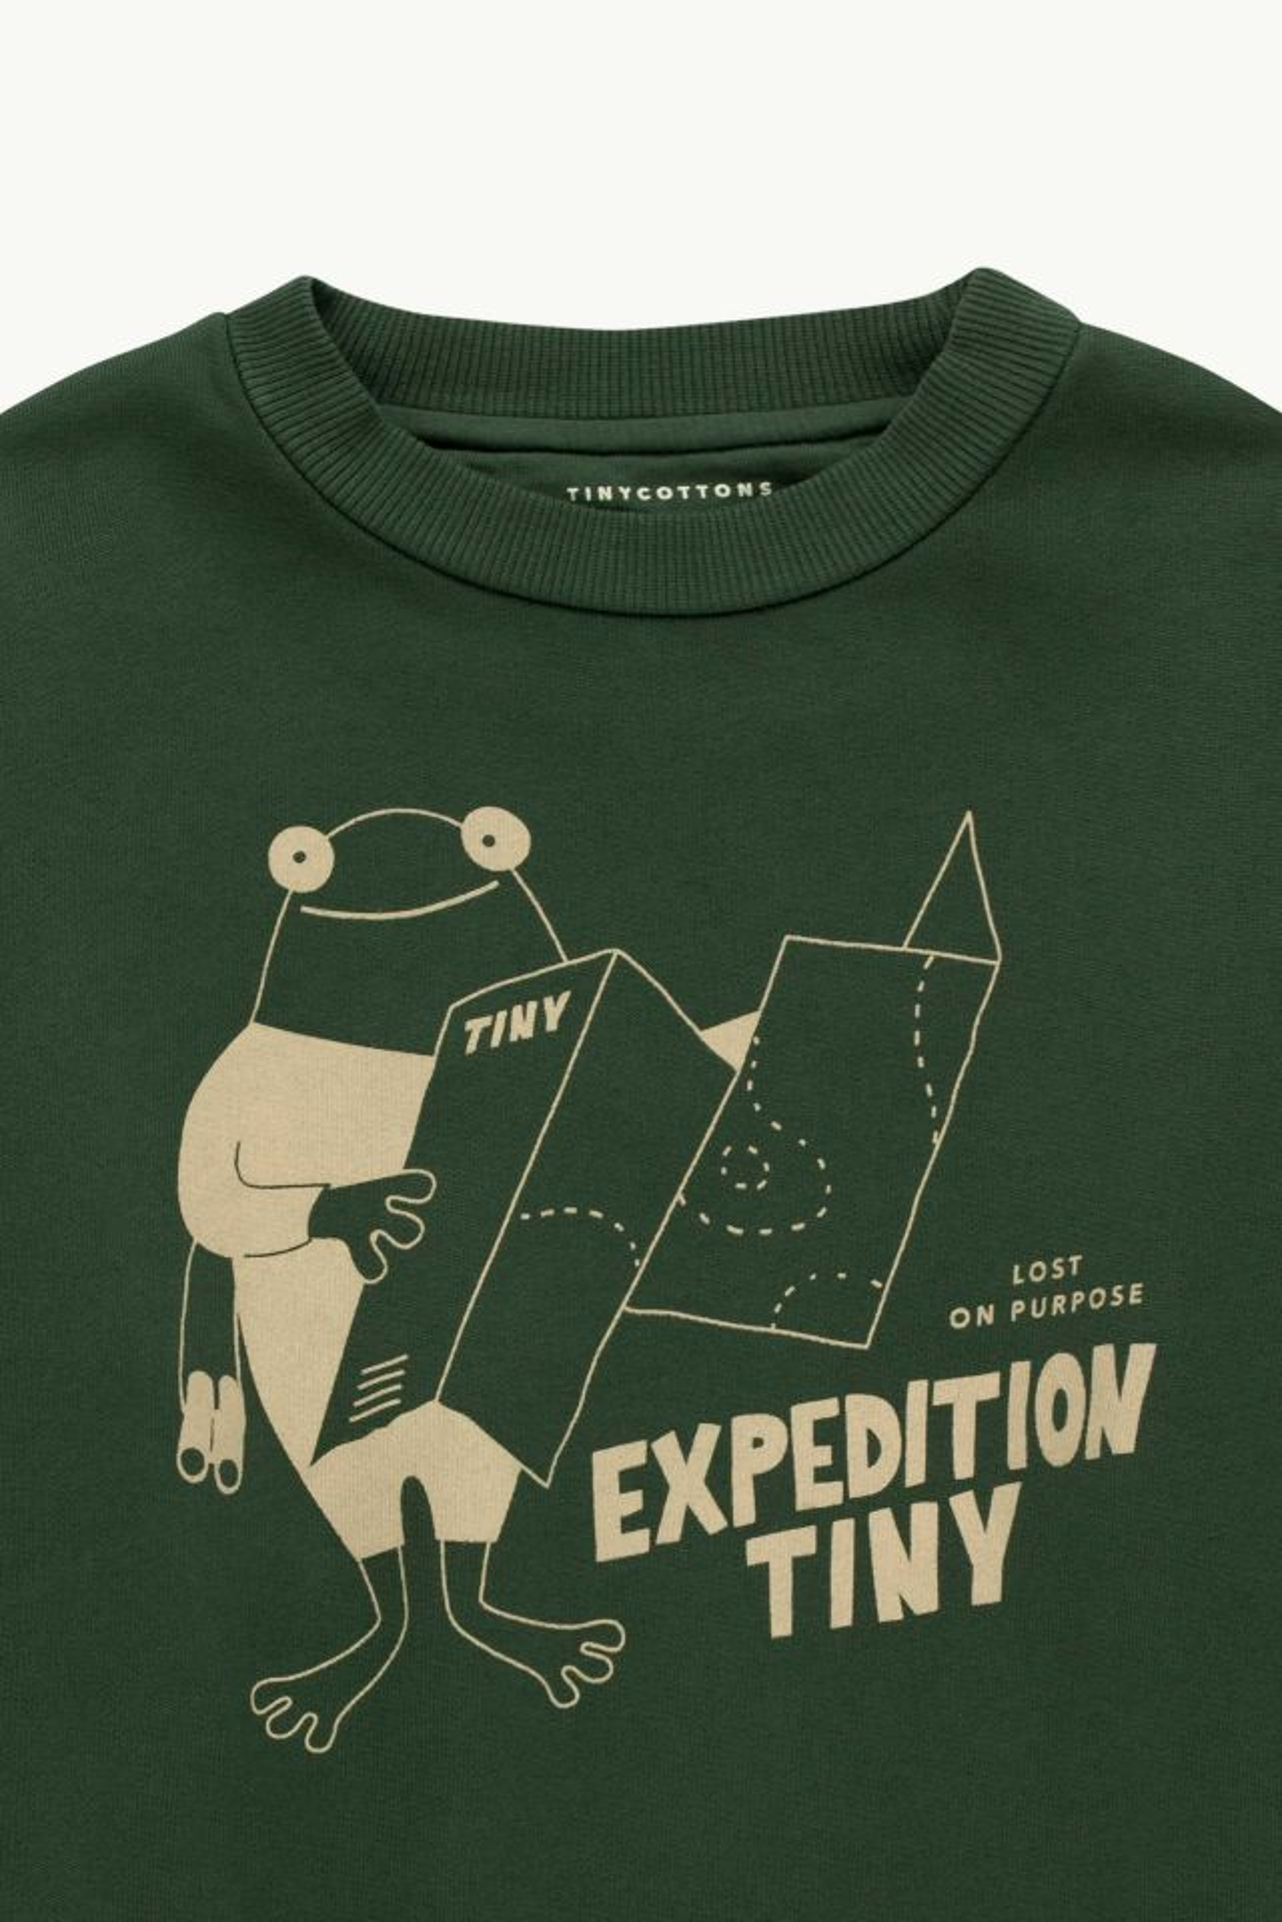 EXPEDITION TINY SWEATSHIRT